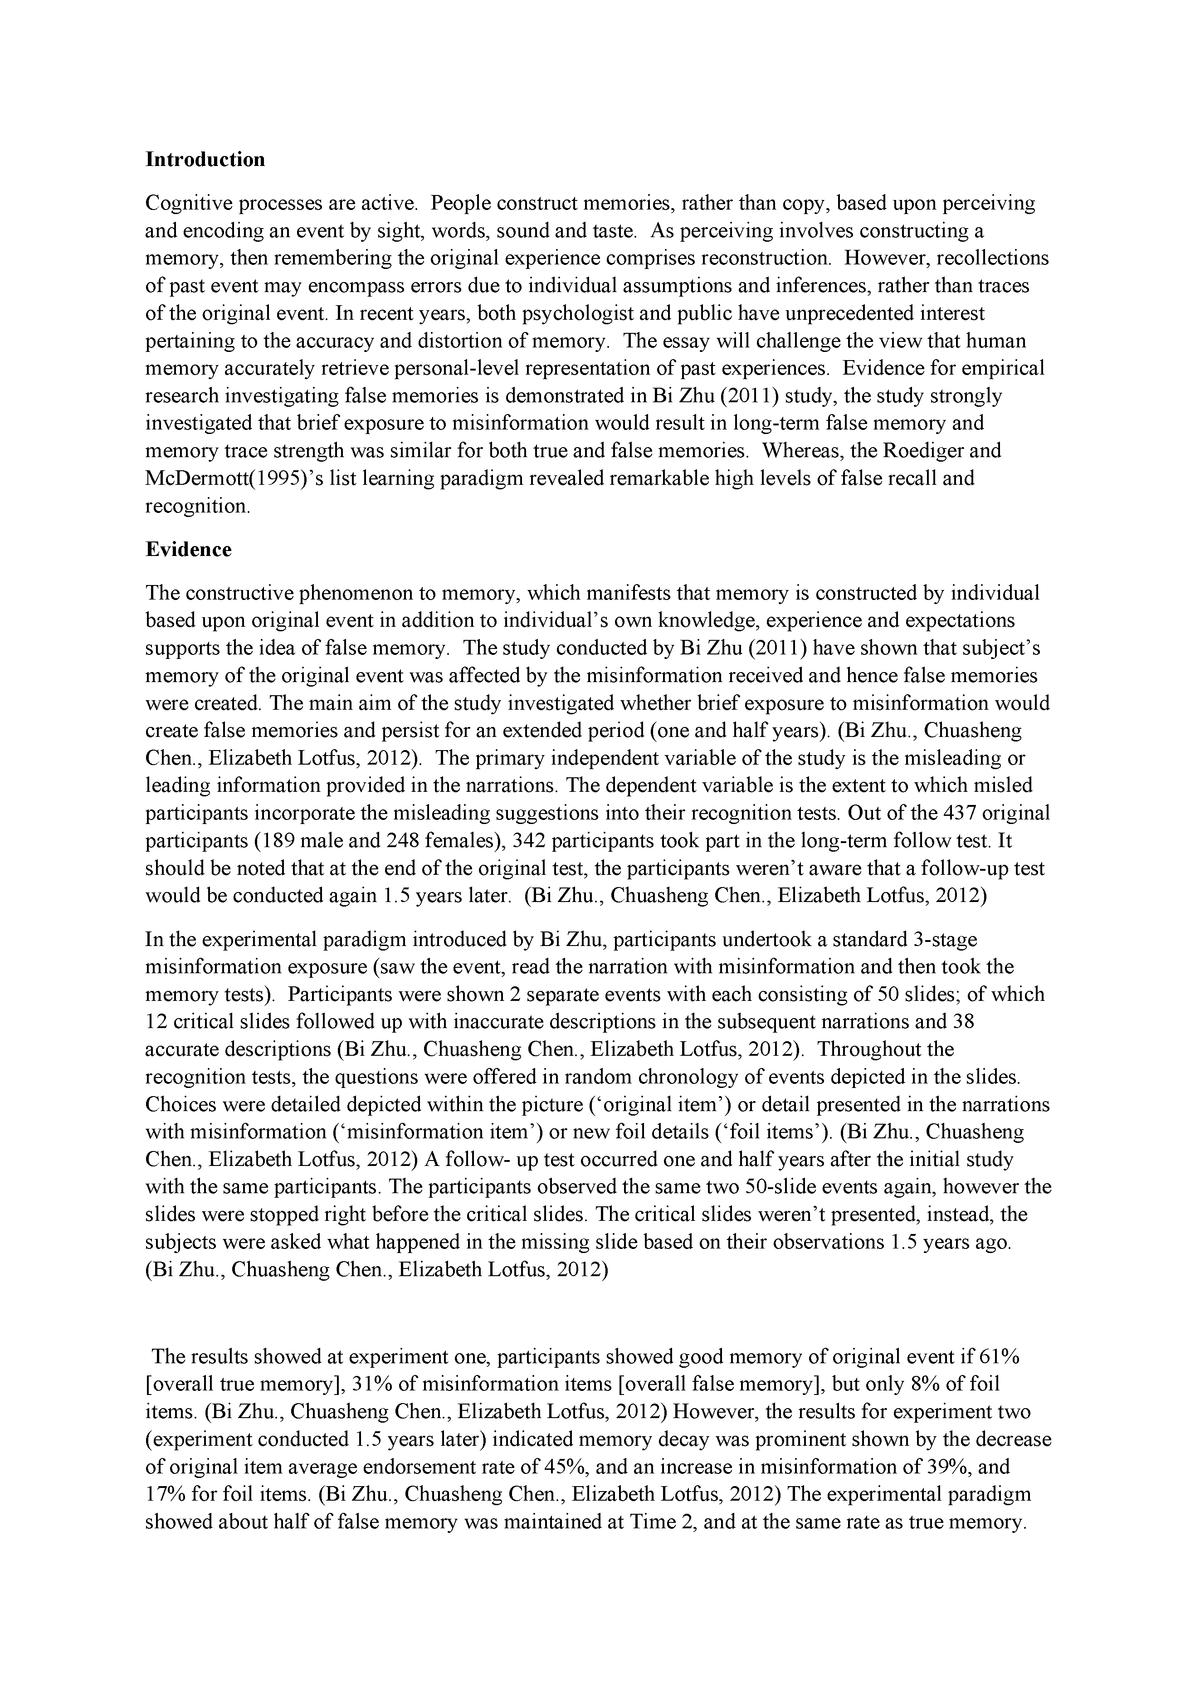 Proper way to write an essay paper